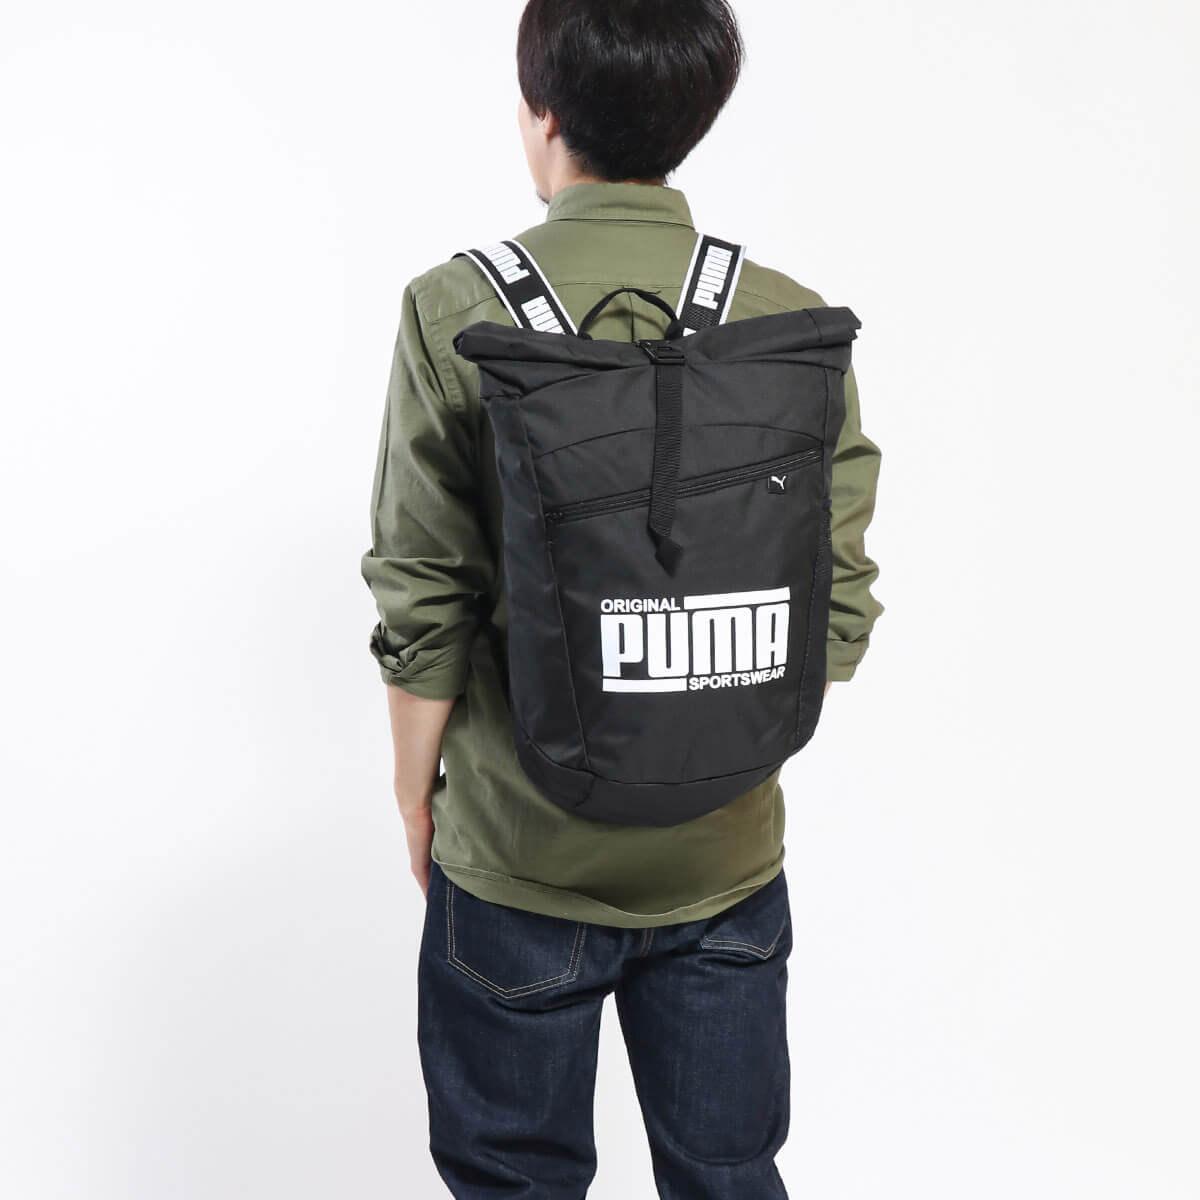 4013723c59 ... [SALE 30% OFF] PUMA rucksack backpack mens womens backpack daypack A4  23L commuting ...